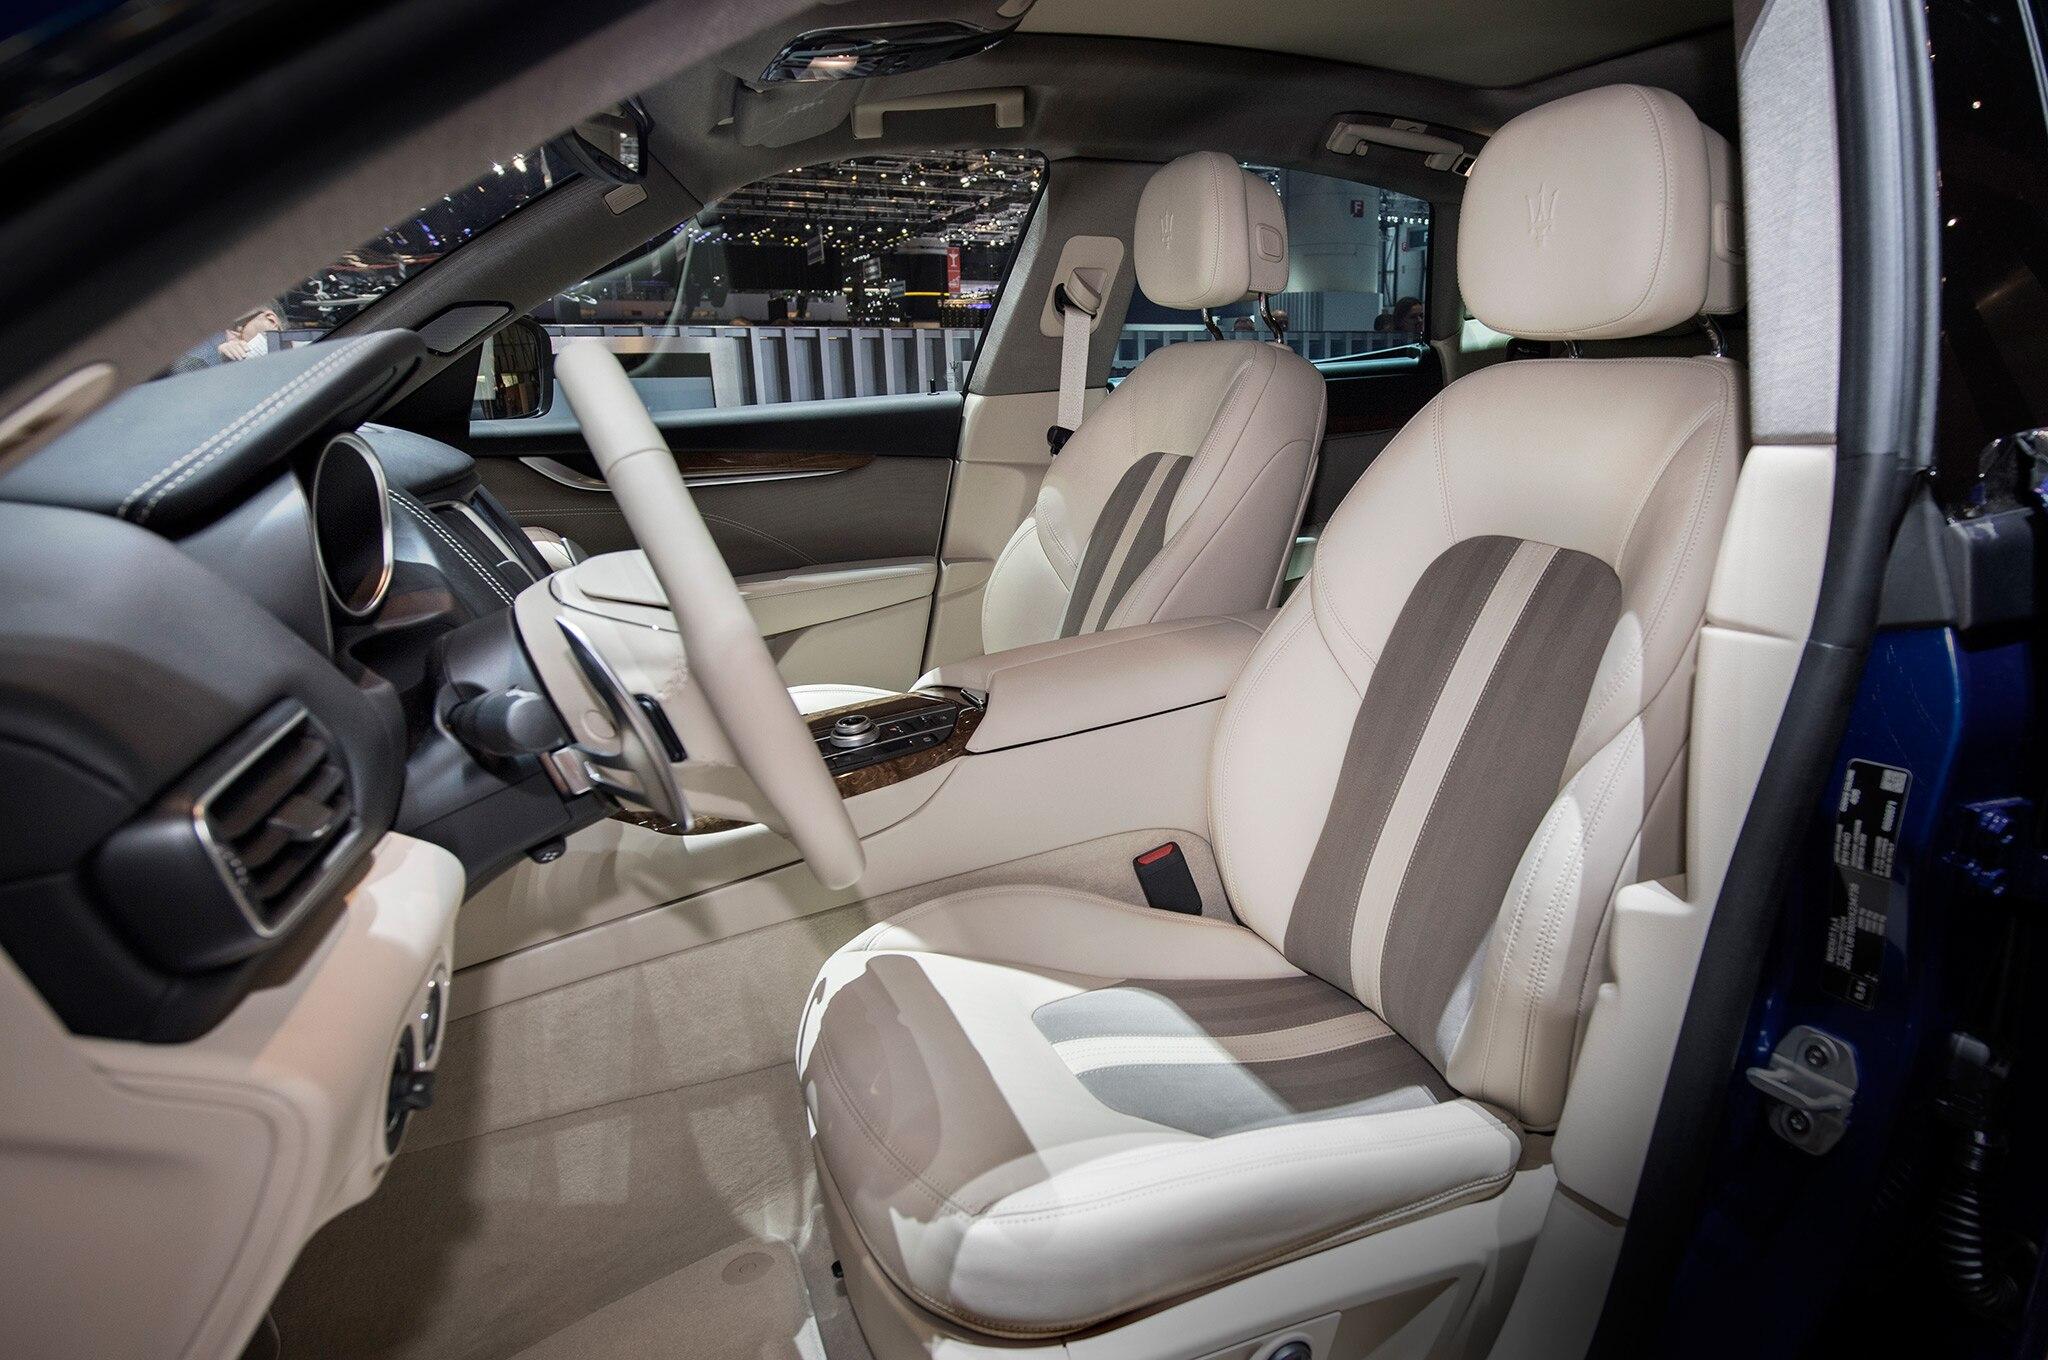 wards u2019 auto releases 2017 10 best interiors list